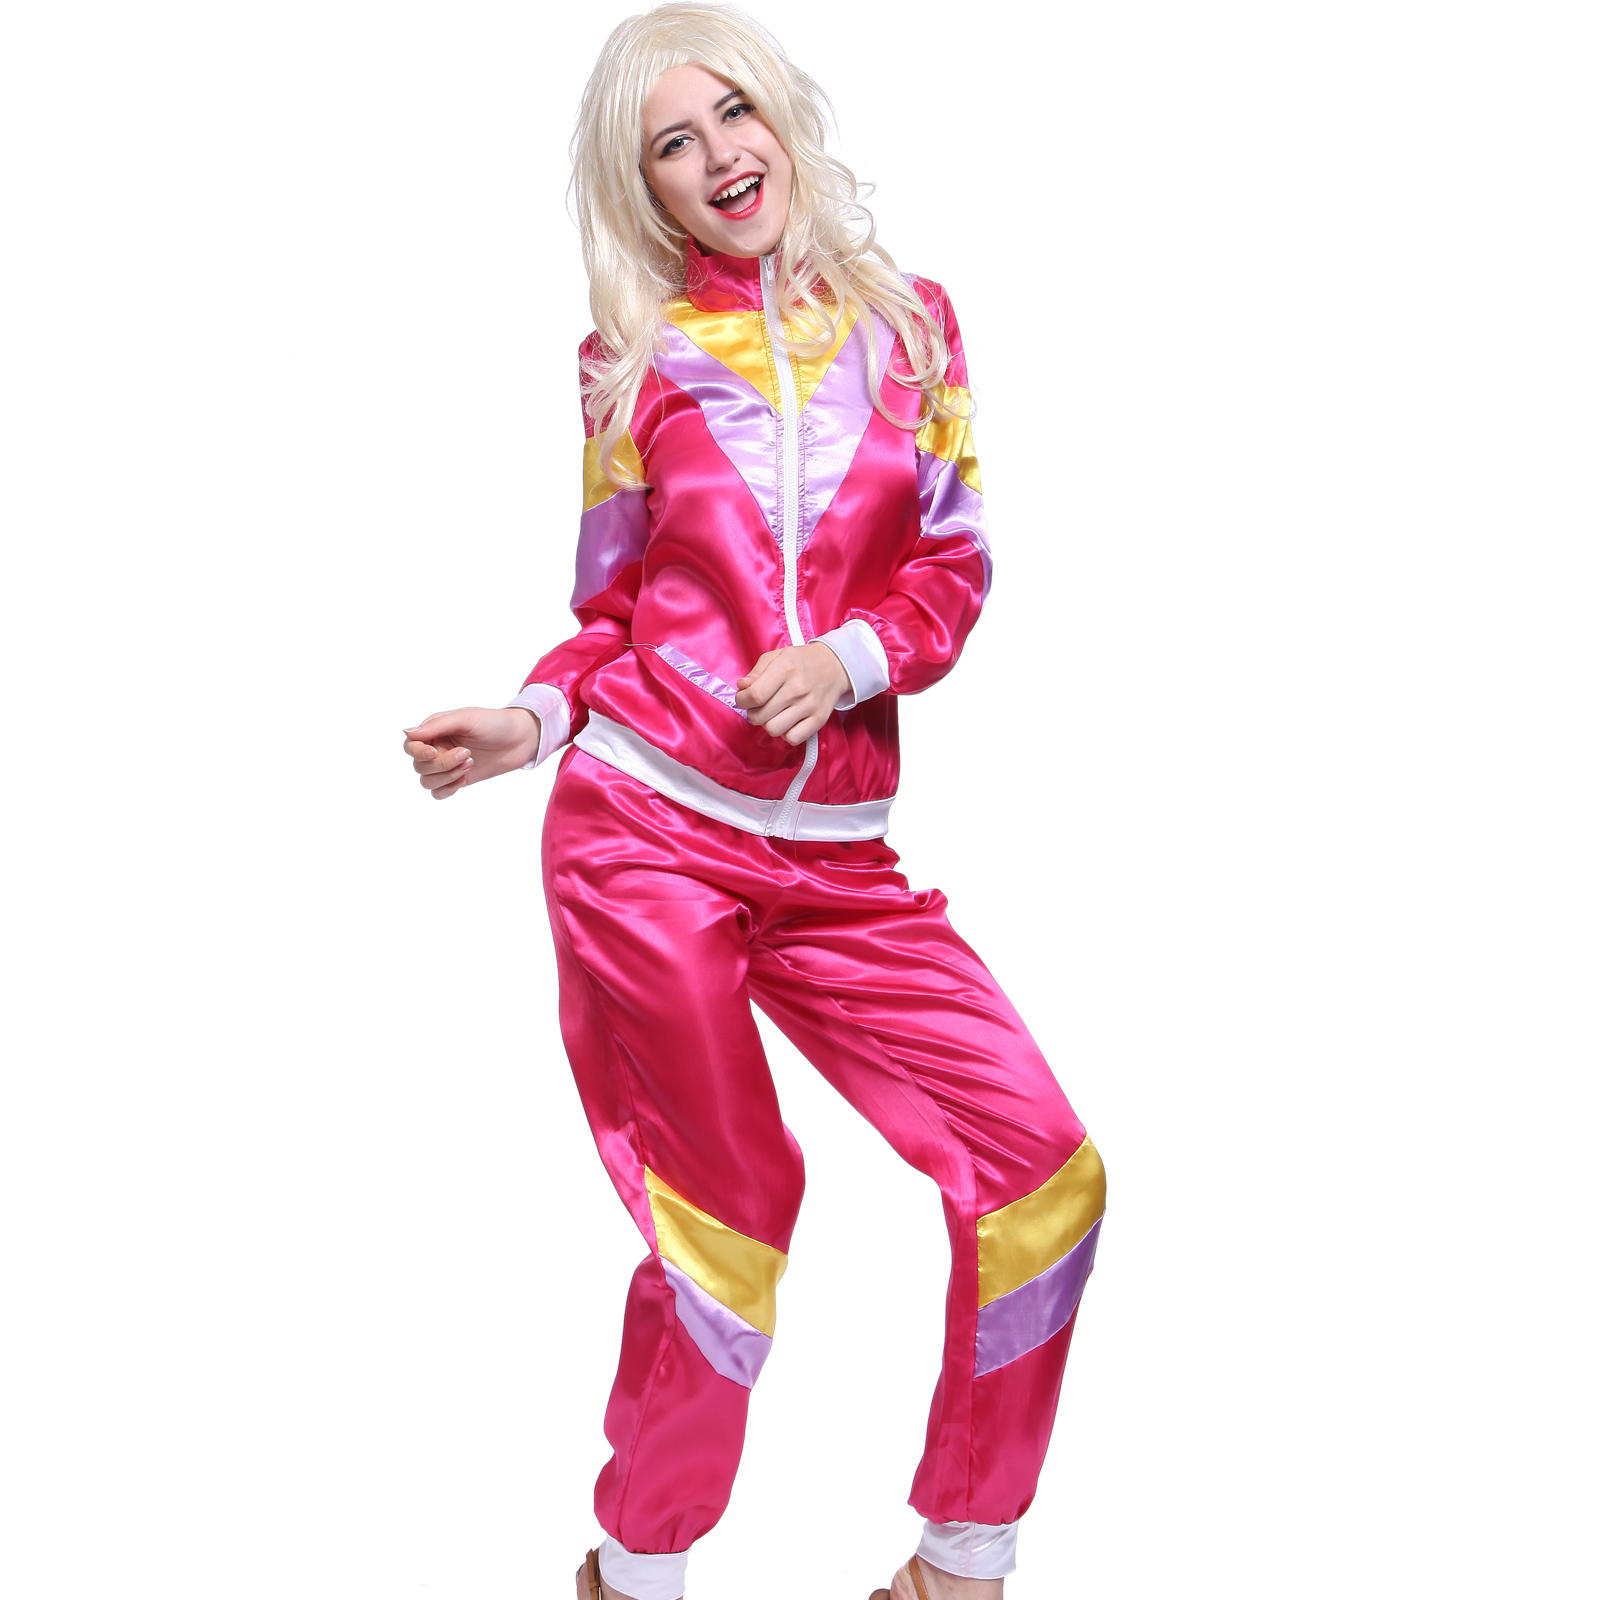 D guisement costume tenue survetement annee 80 1980s unisexe 118 218 hip hop ebay - Annee 80 tenue ...